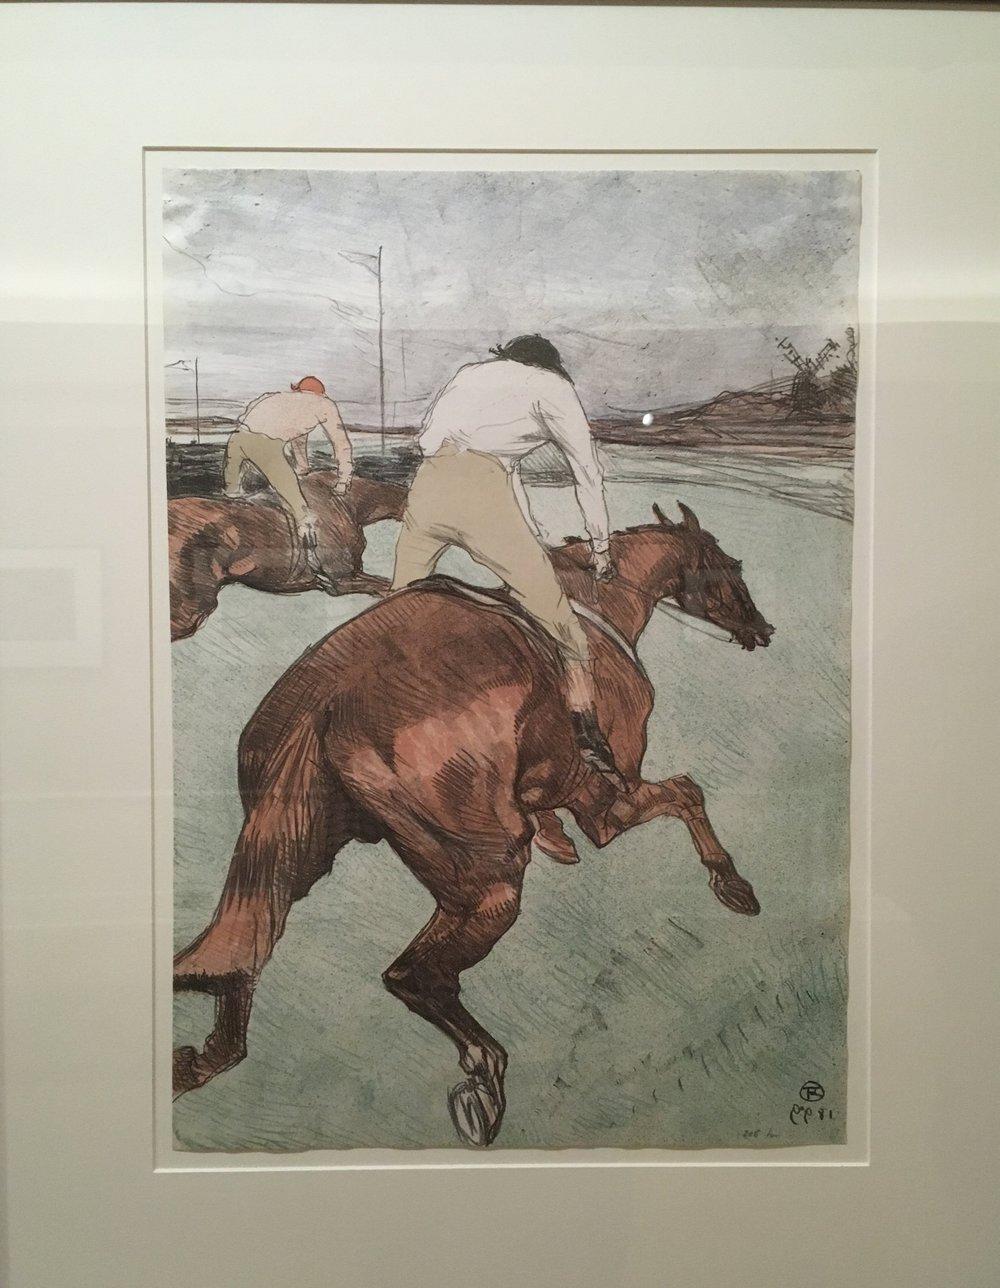 Henri de Toulouse-Lautrec,   Le Jockey (The Jockey)  , 1899, Color lithograph on China Paper